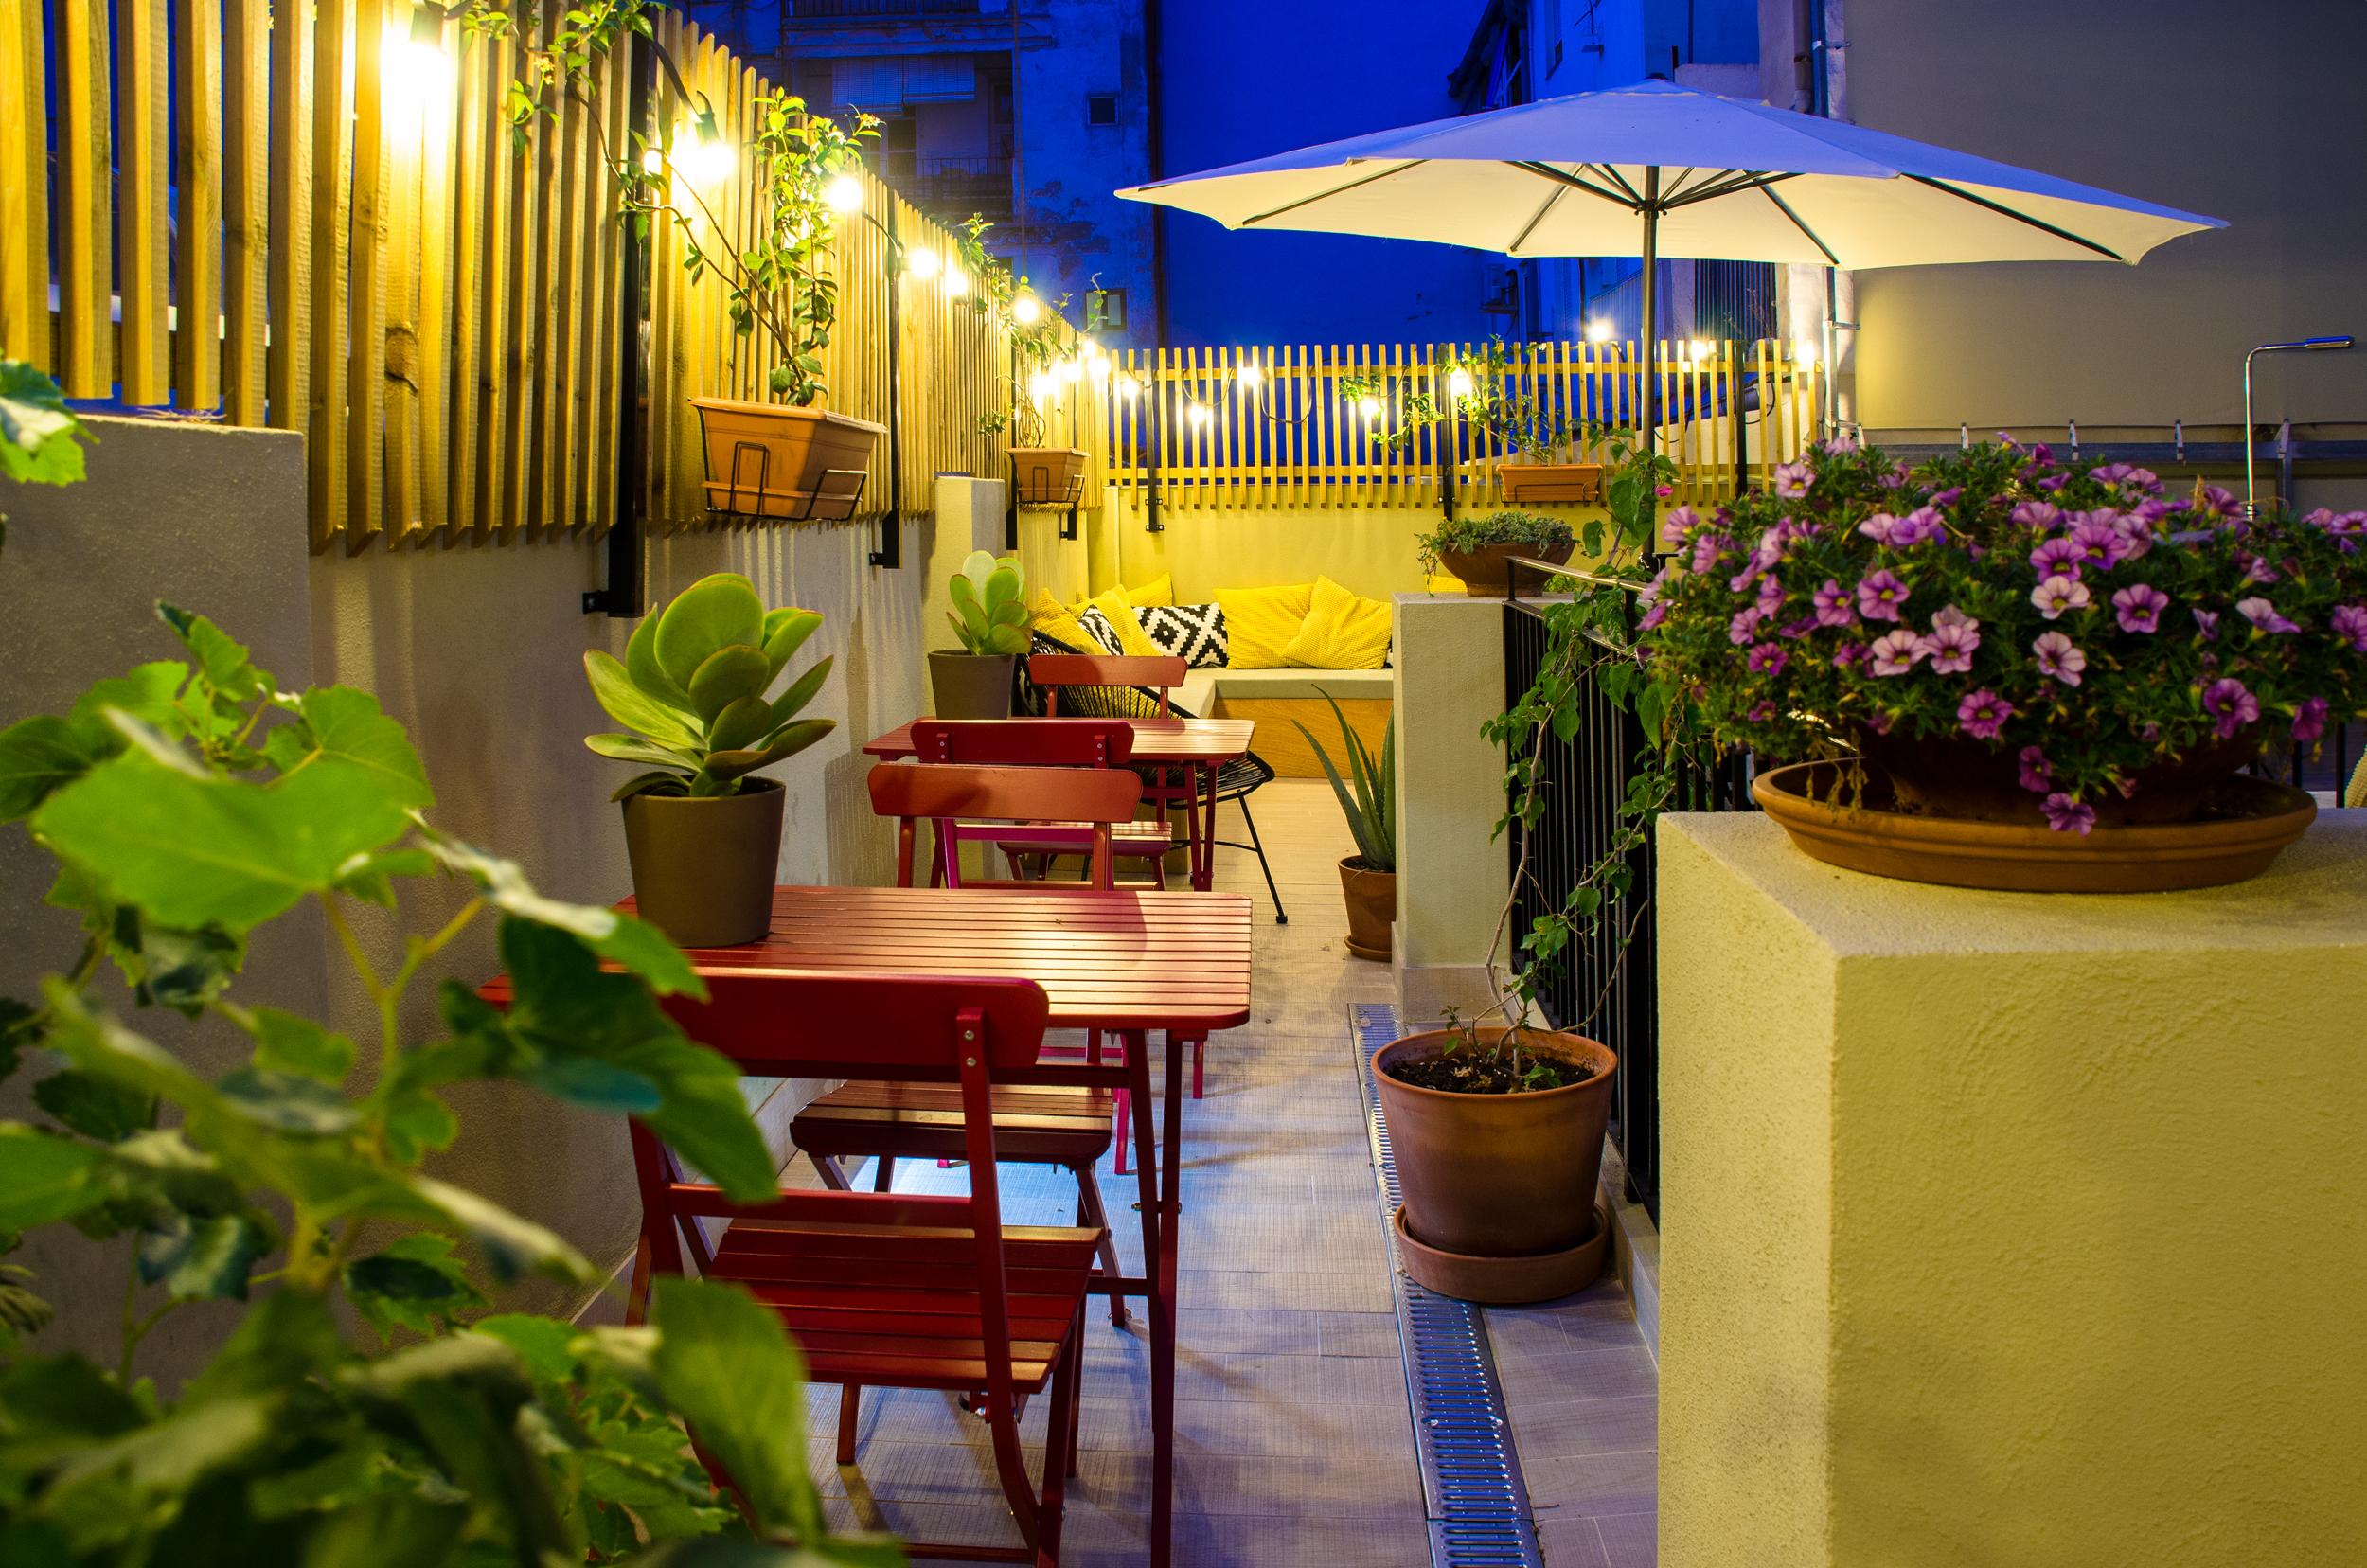 Terrace of Zalamera B&B in Valencia, Spain (70 of 92).jpg